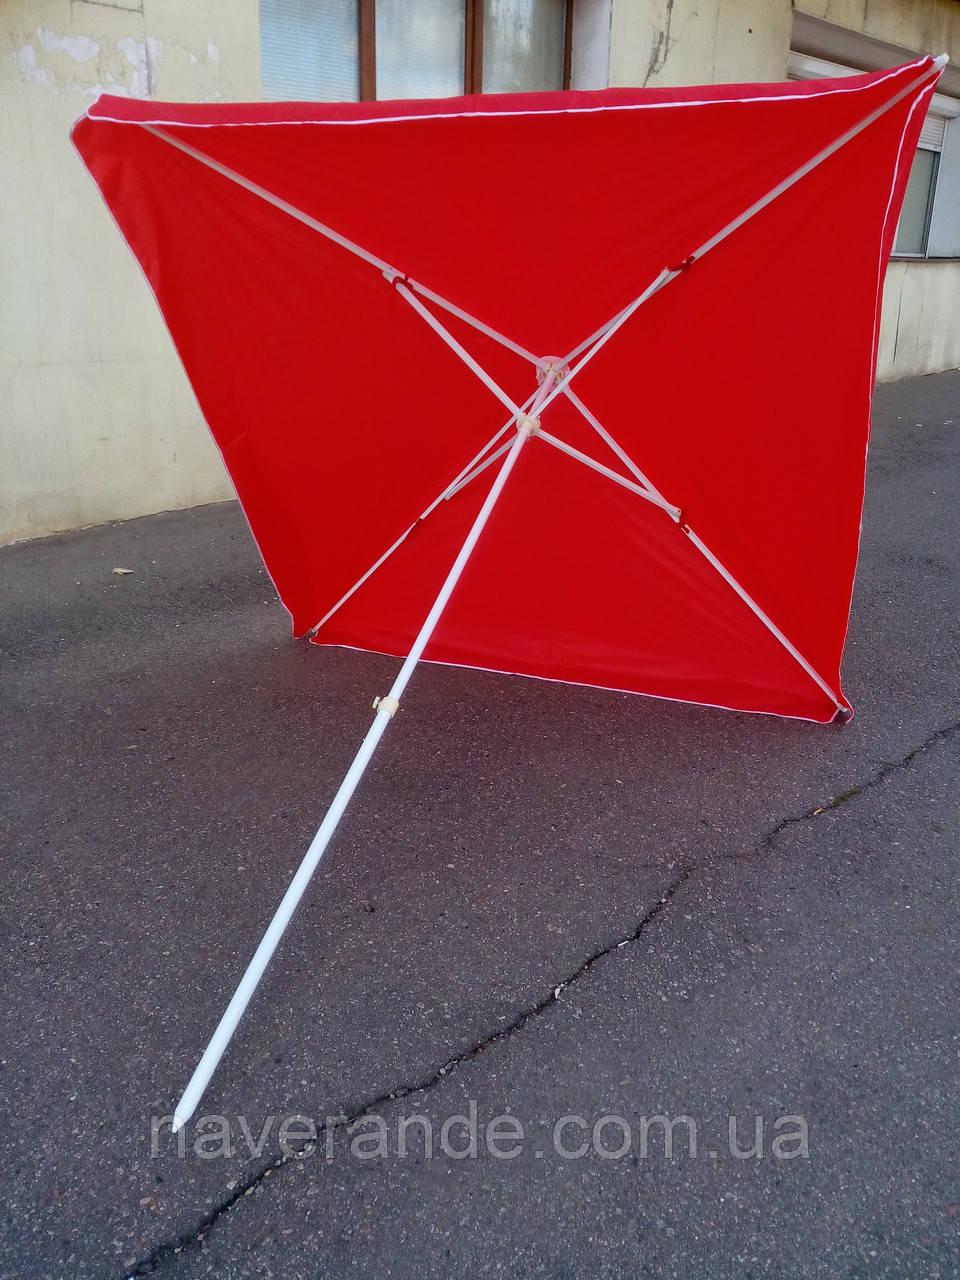 Квадратный пляжный зонт от солнца (красный 2,5х2,5 м)